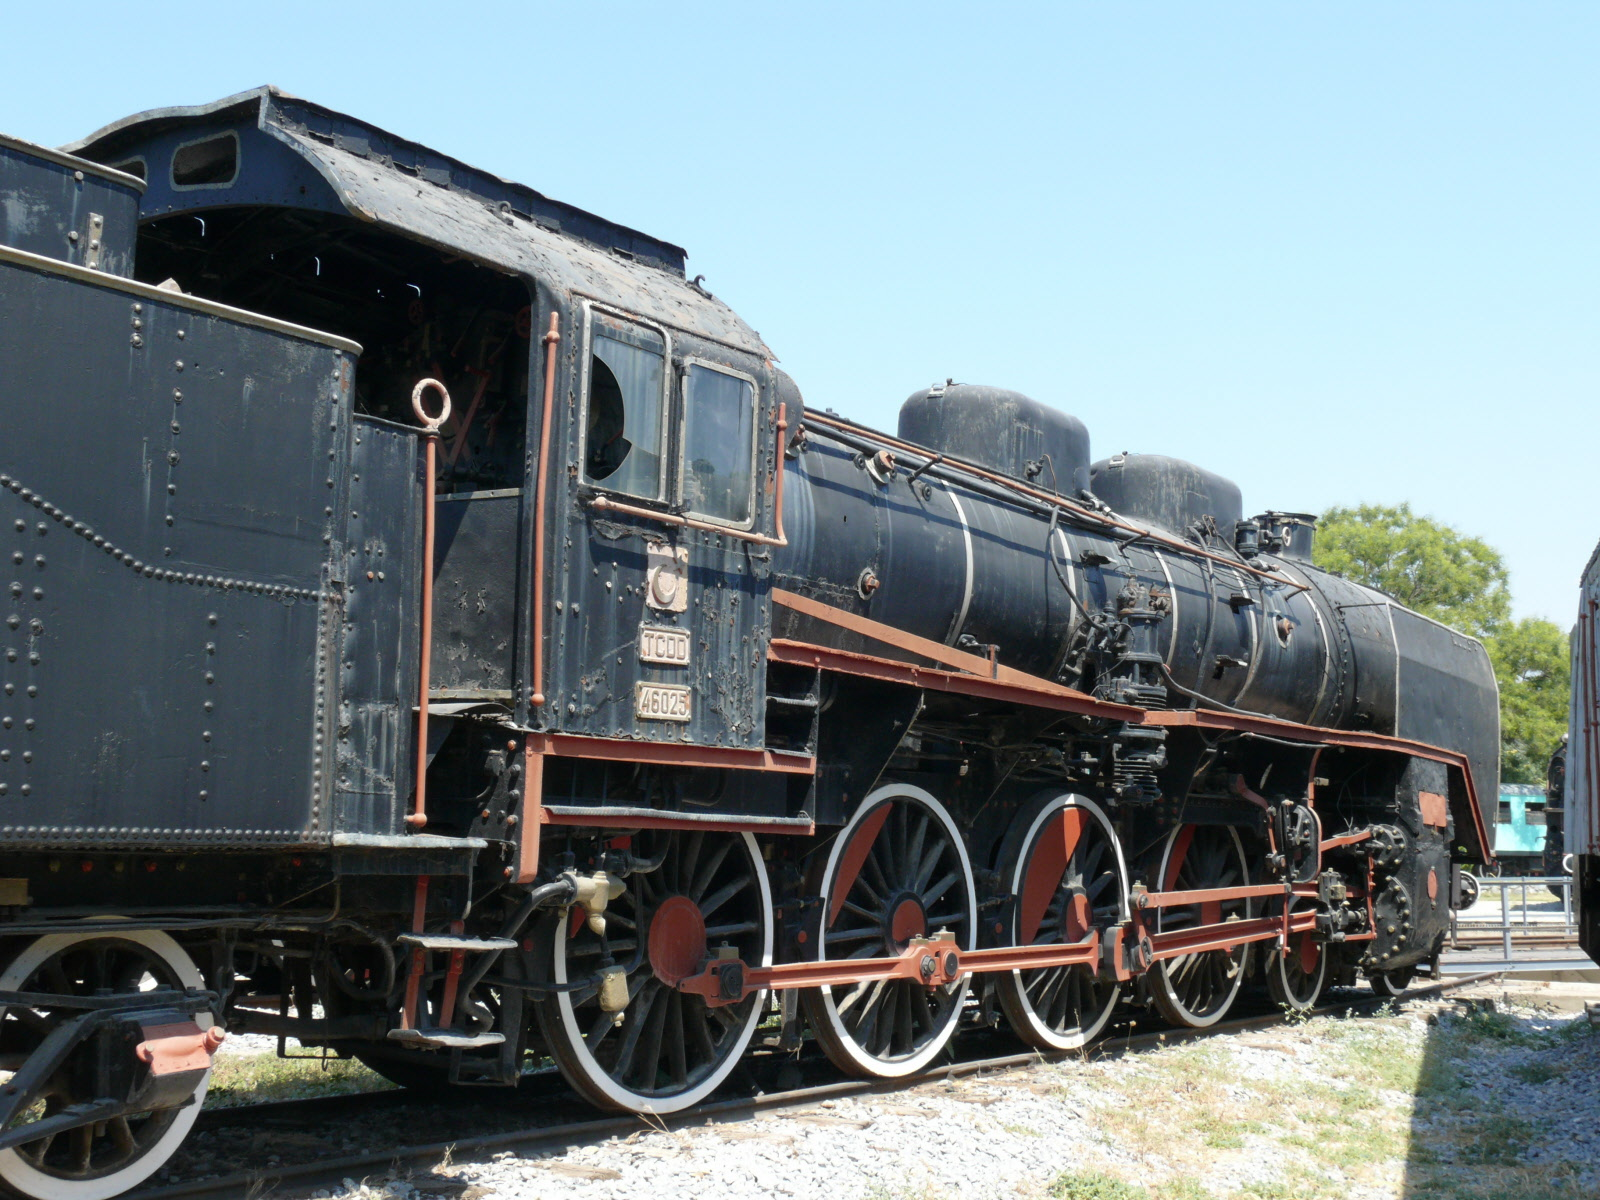 Photos from the Çamlik Railroad Museum, 2009